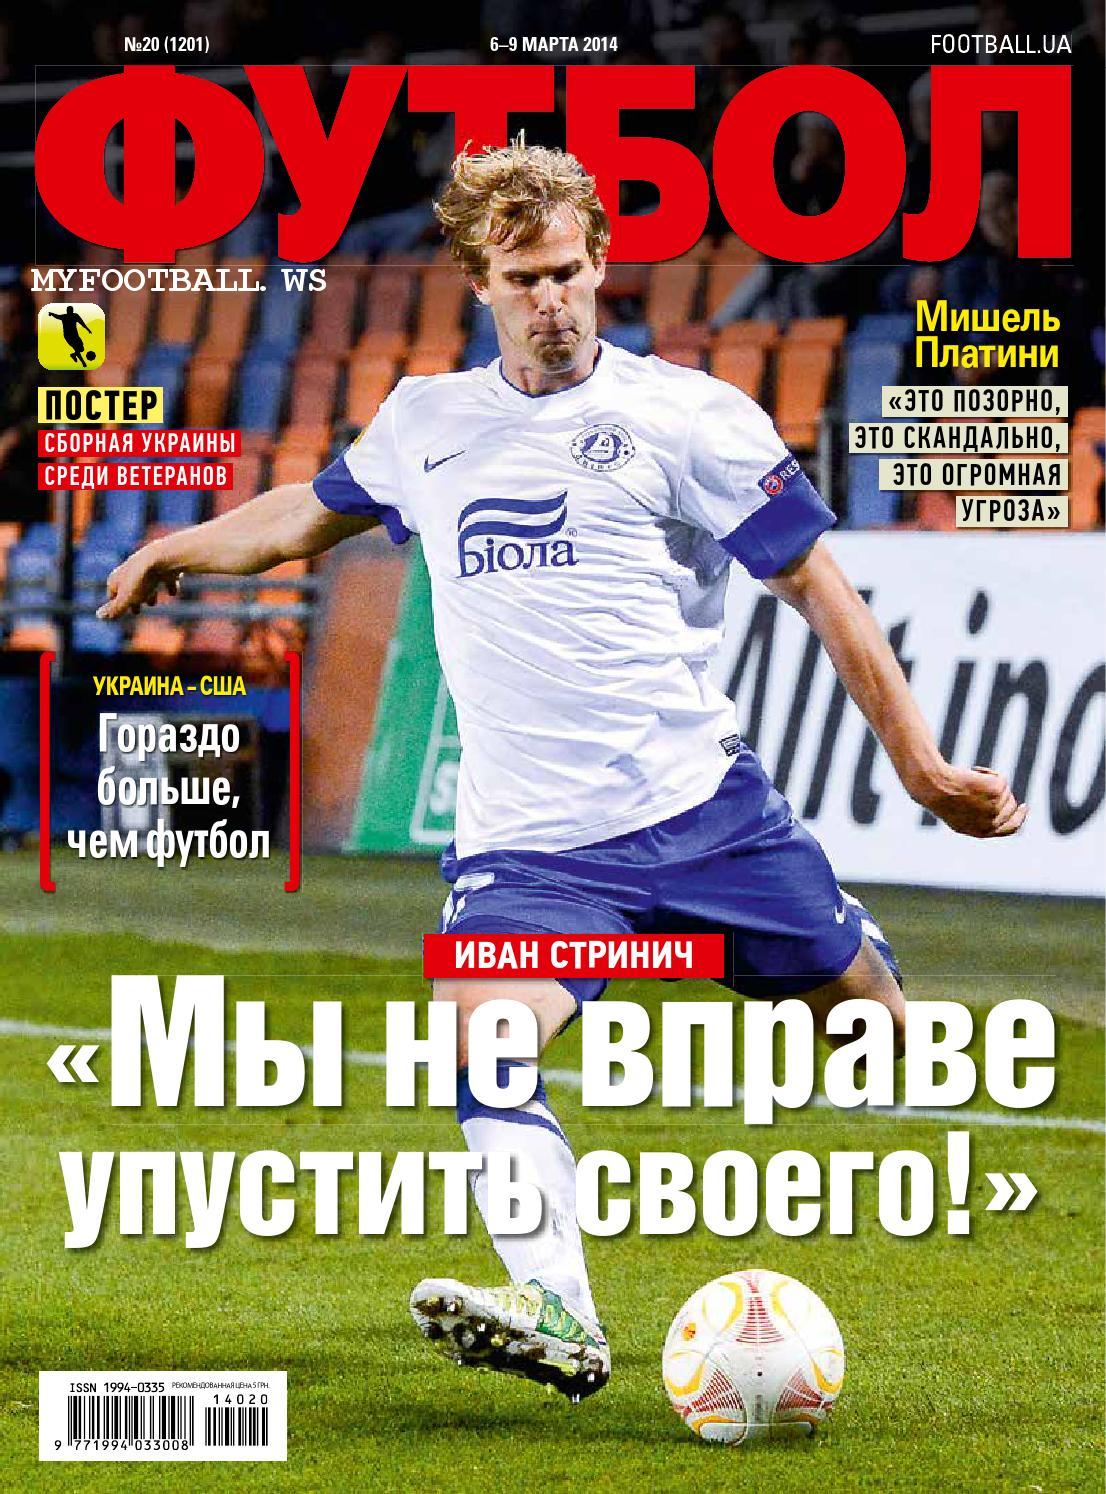 Макаренко: Динамо само виновато, что упустило победу над Ворсклой